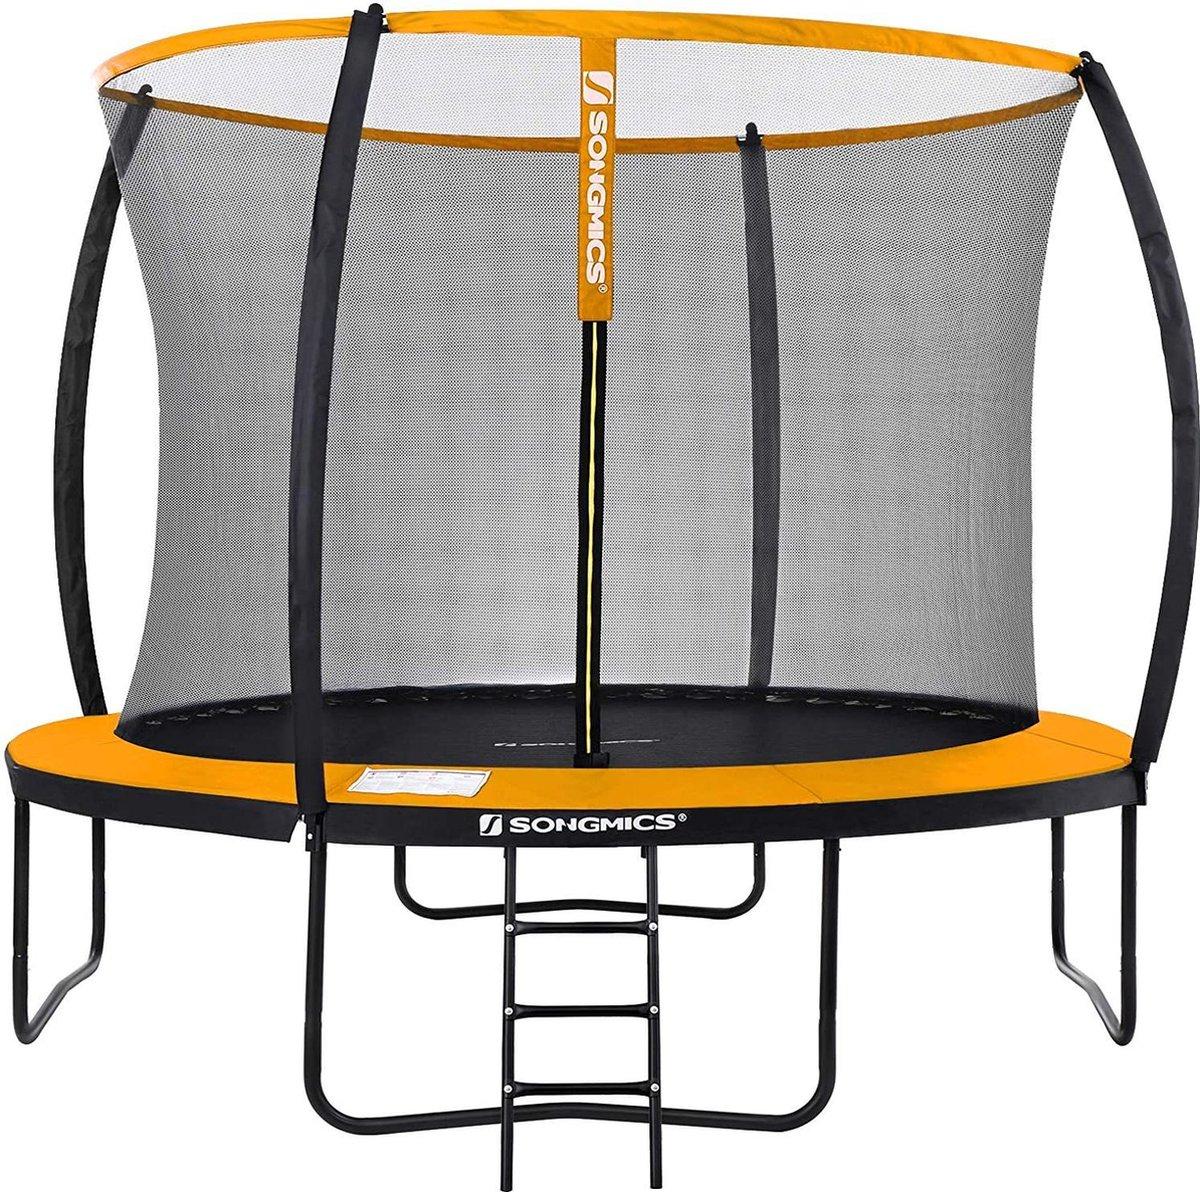 Nancy's Santee Trampoline - Tuintrampoline - Rond - Veiligheidsnet - Ladder - Boogstokken - Veiligheidstest - Zwart - Oranje - 366 cm